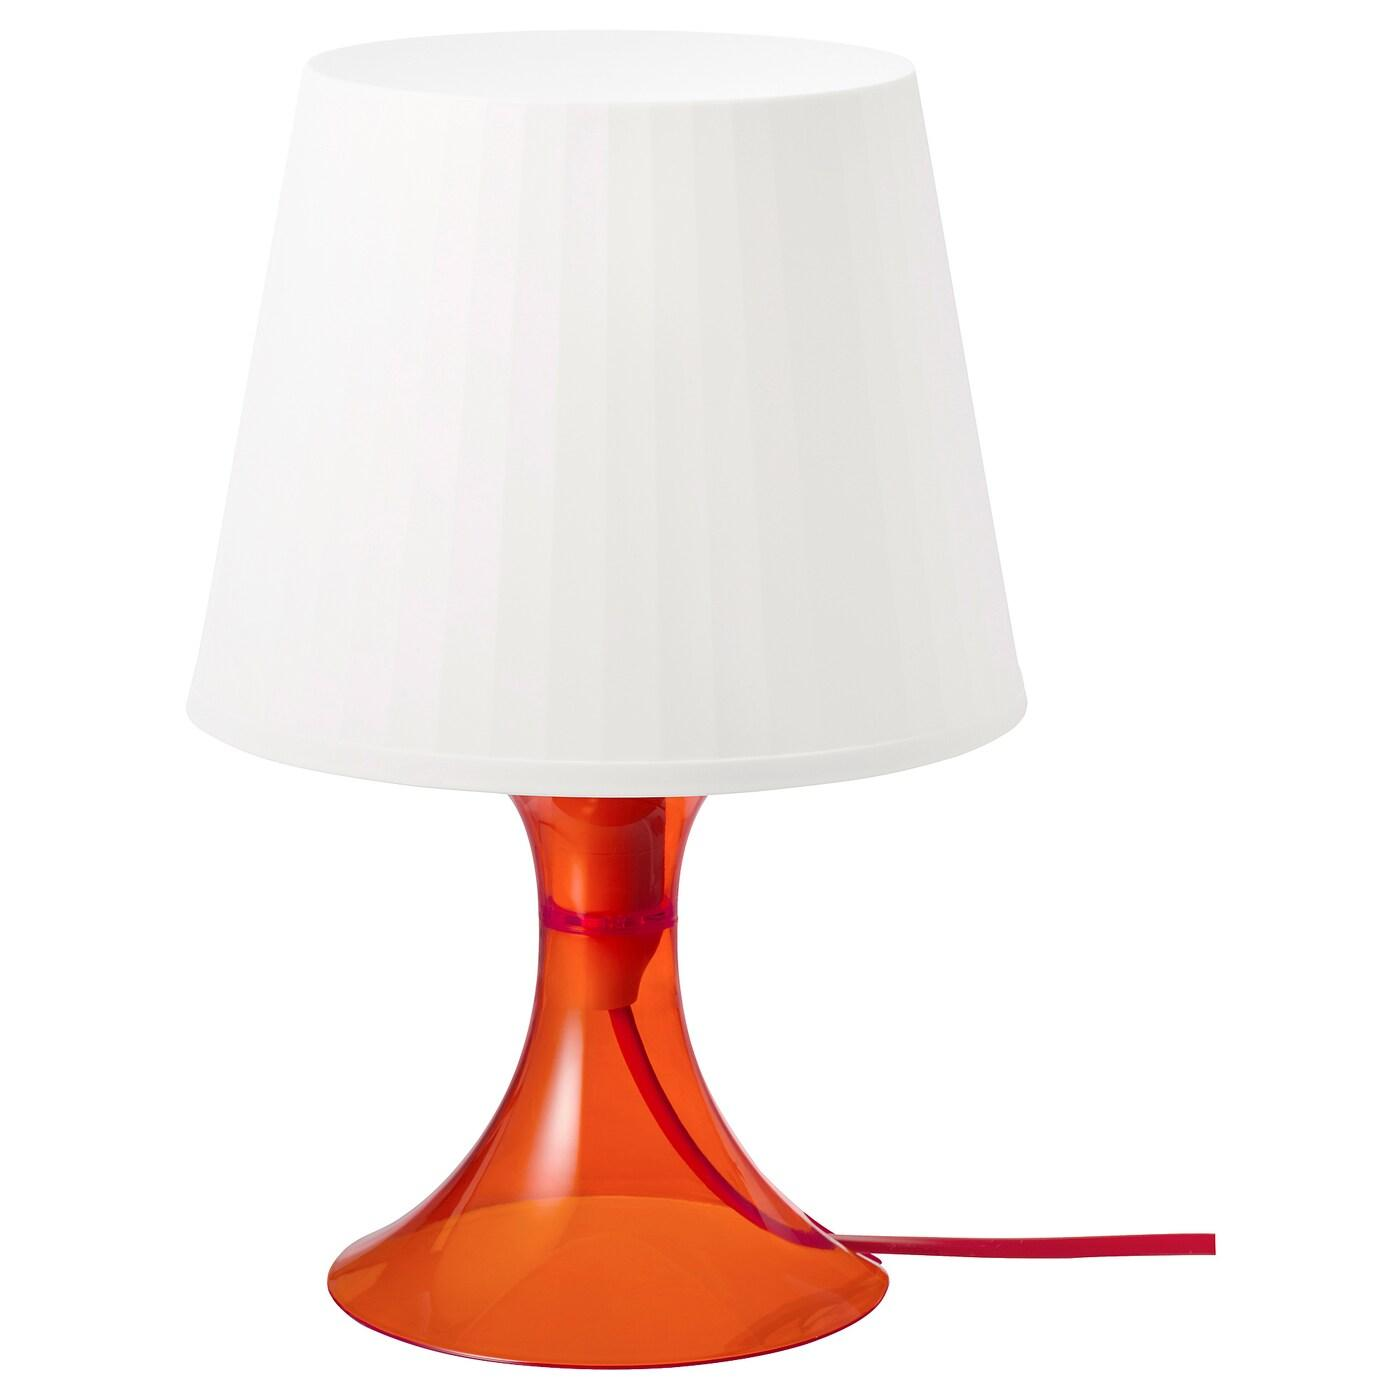 Tischlampe Kupfer Ikea